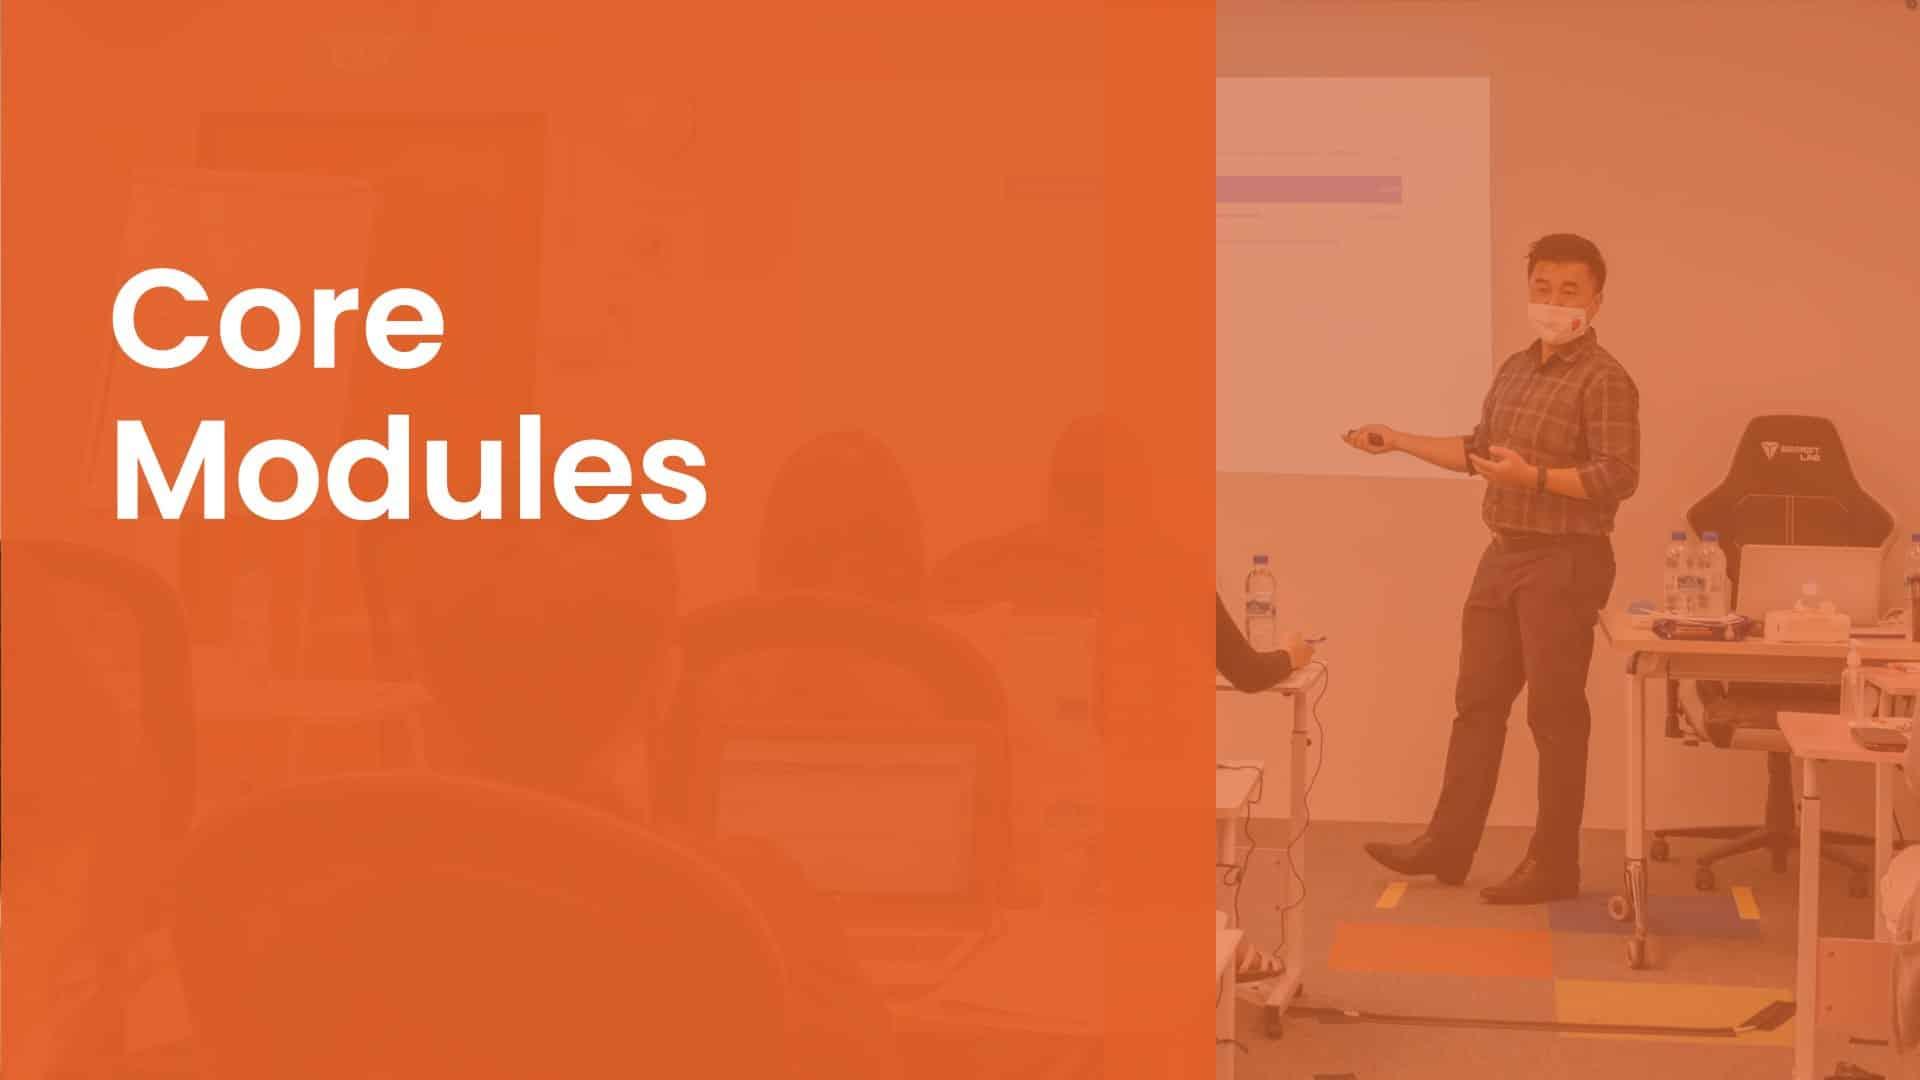 Digital Marketing Course Core Modules